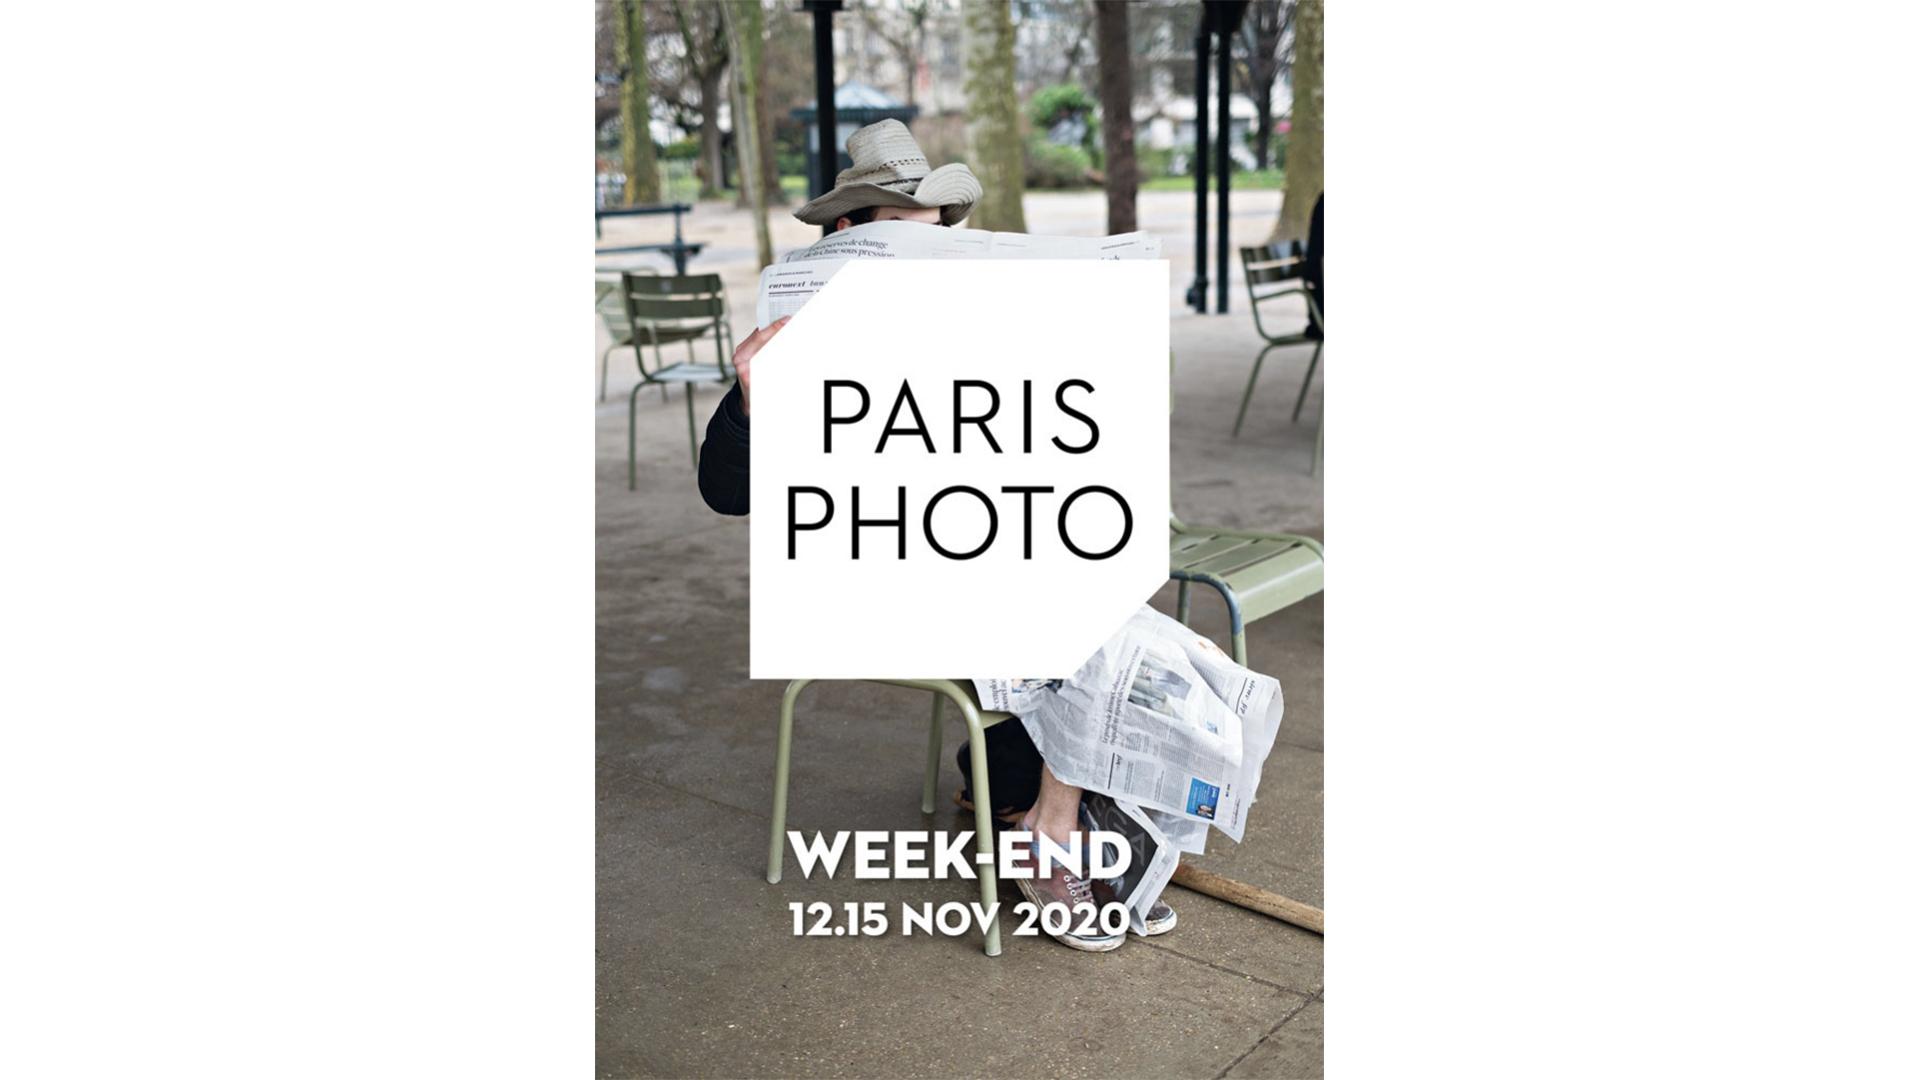 FOTO-WOCHENENDE PARIS